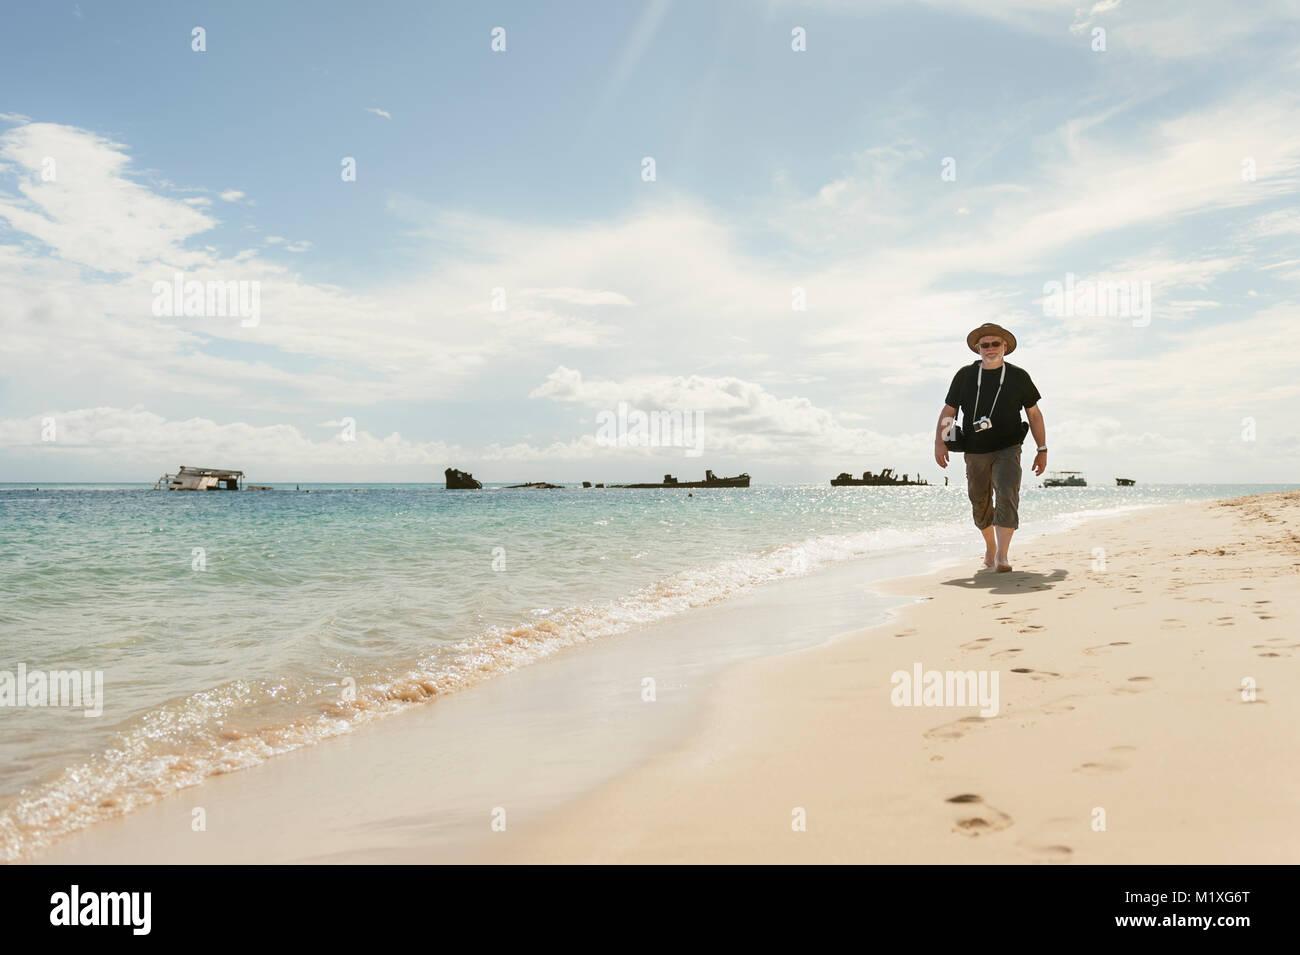 Reife Frau zu Fuß am Strand in Australien Stockfoto